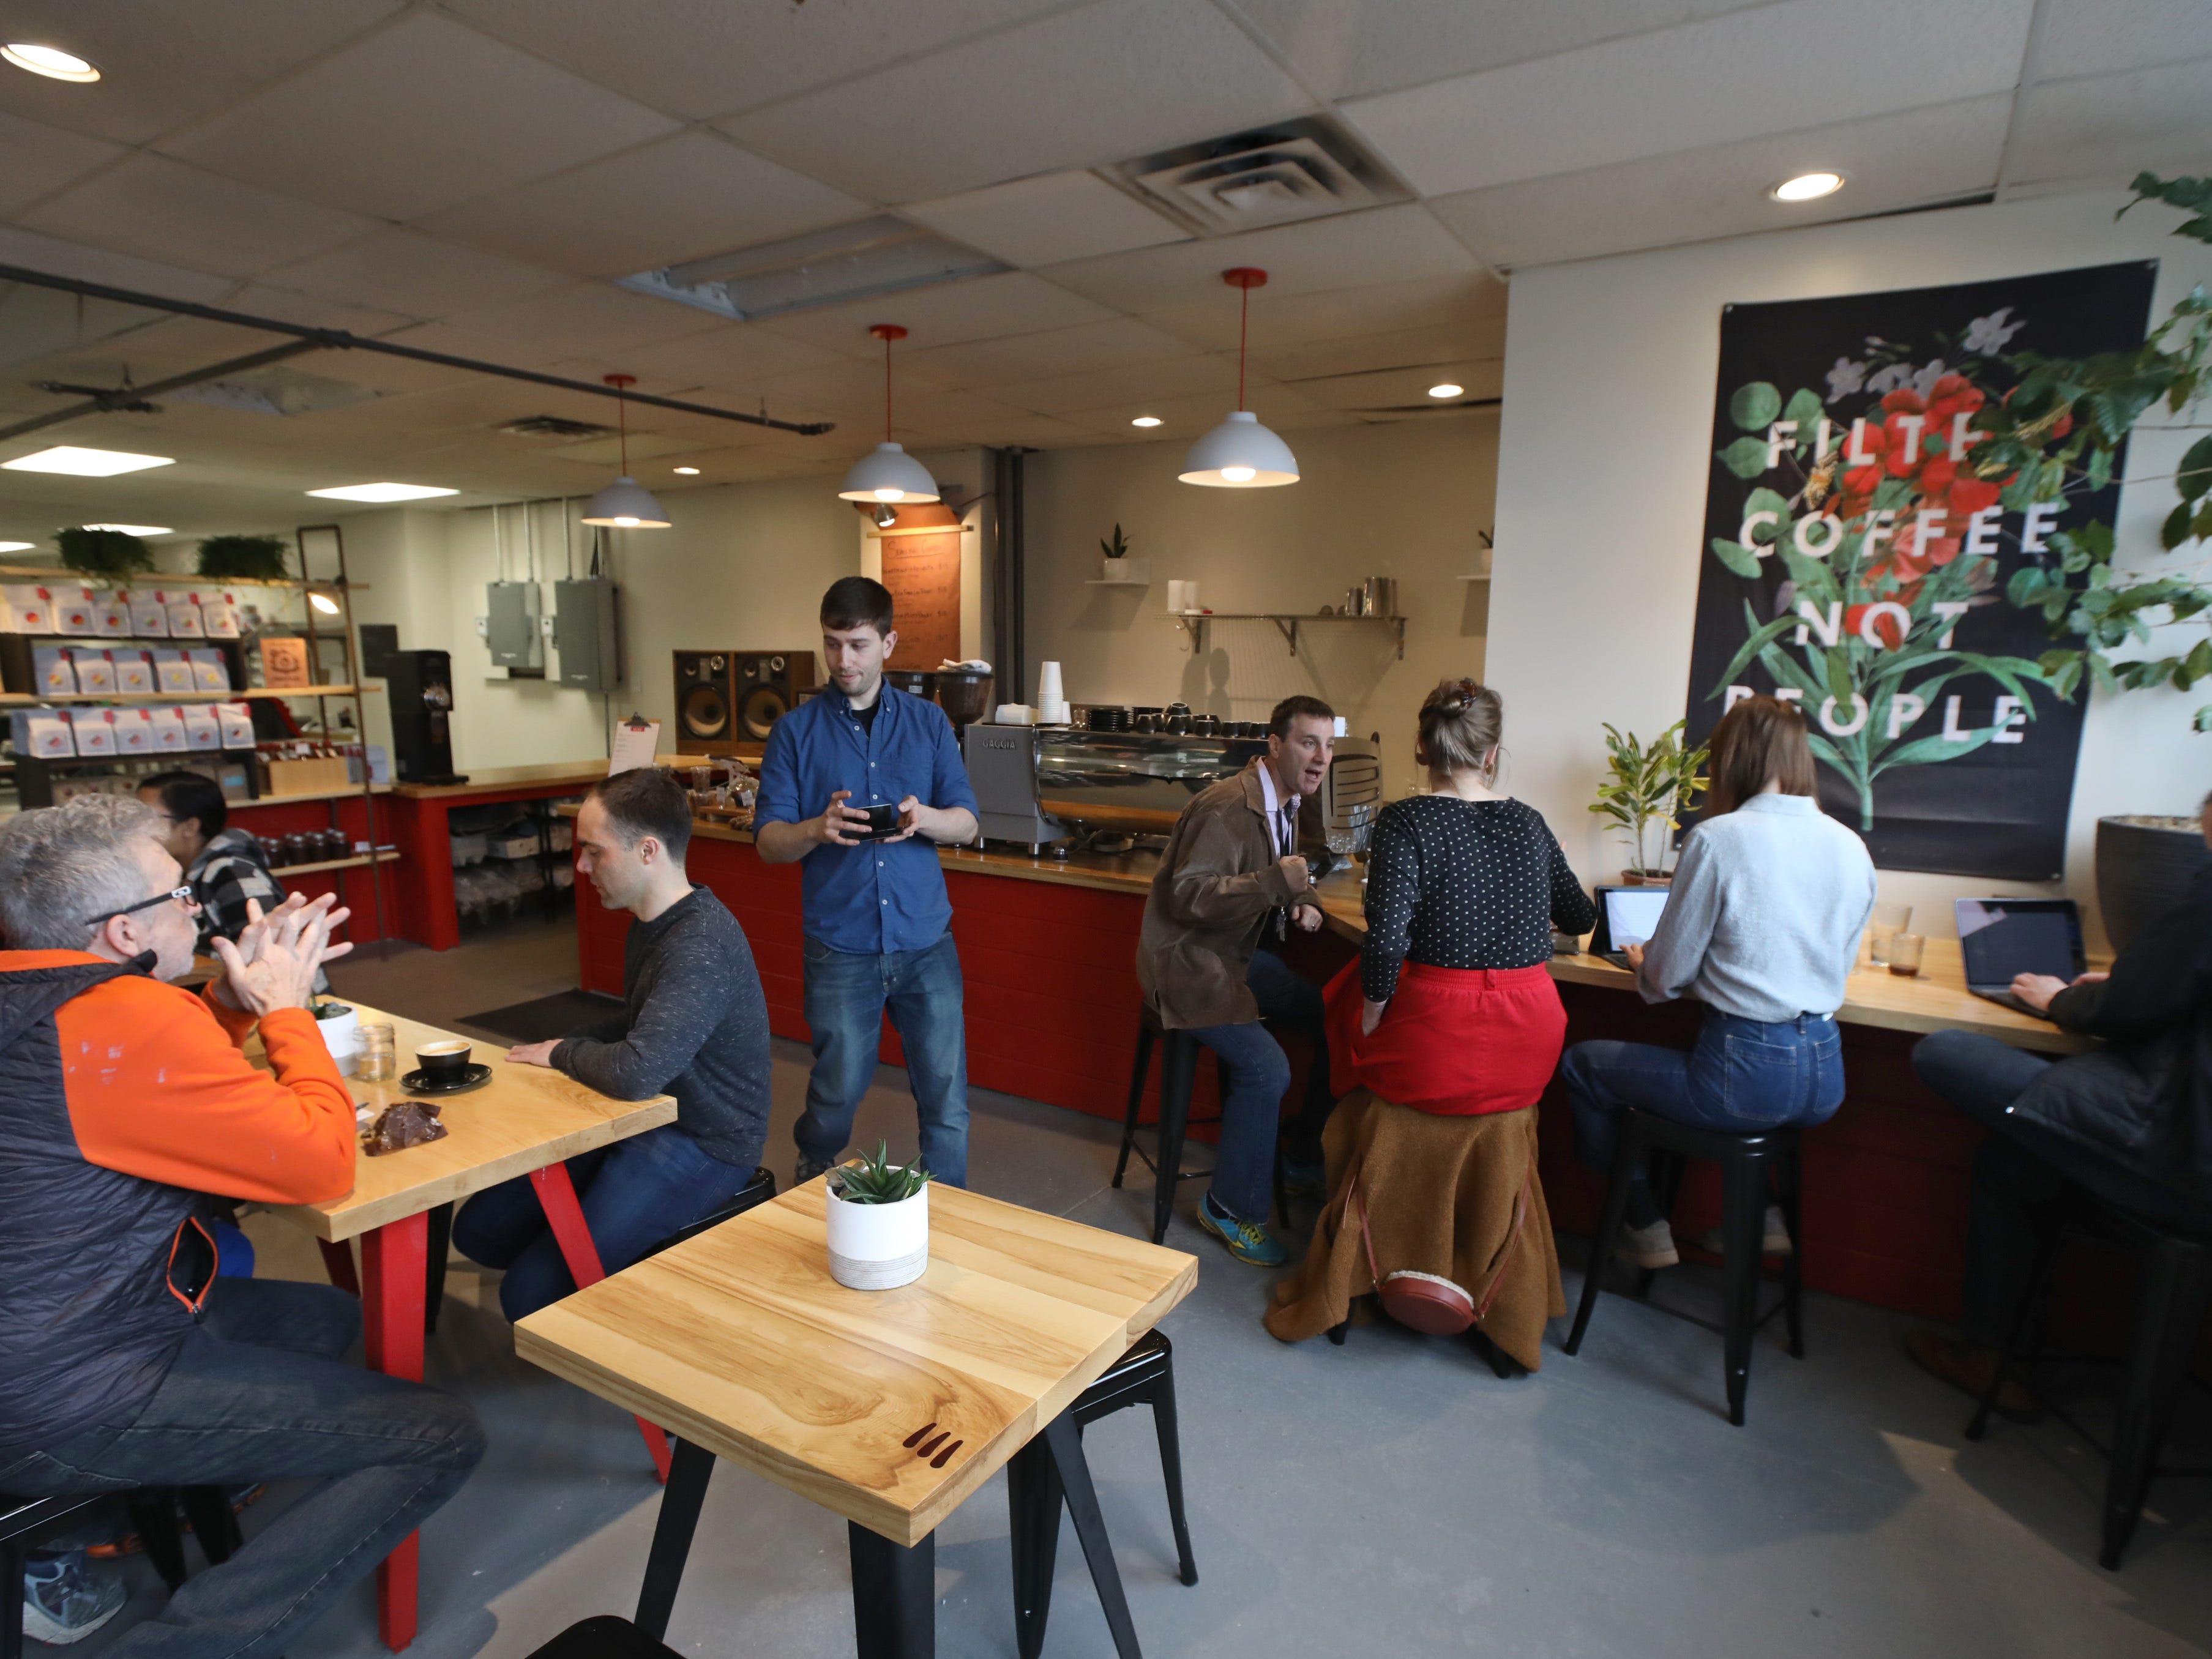 Adam Solomon, bar manager, center, serves up a freshly brewed mug of coffee inside the coffee bar.